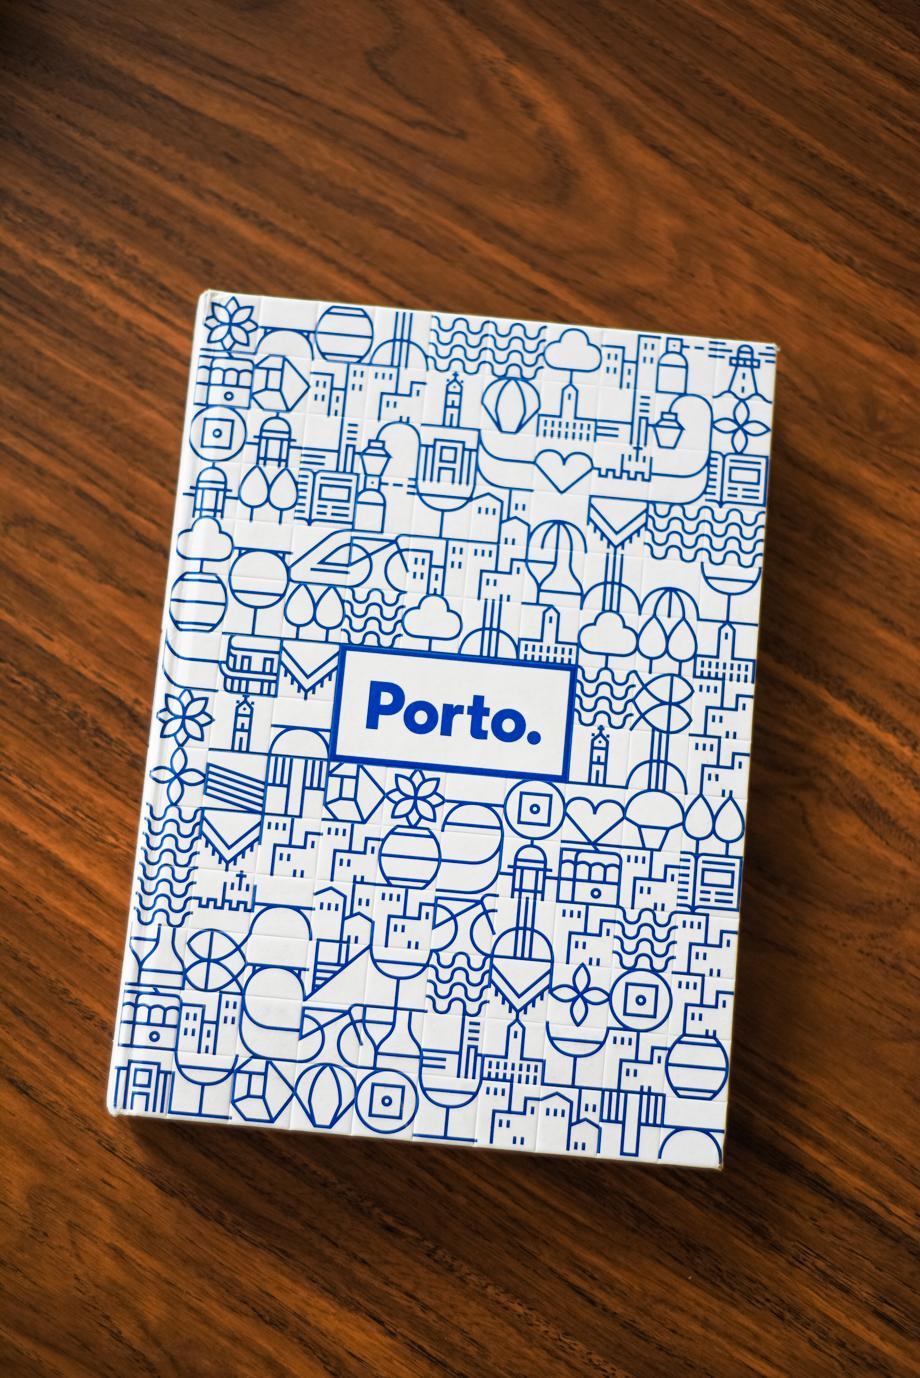 WebQuality-Porto-10yearsVentigrate-AnaisStoelenPhotography-7.jpg